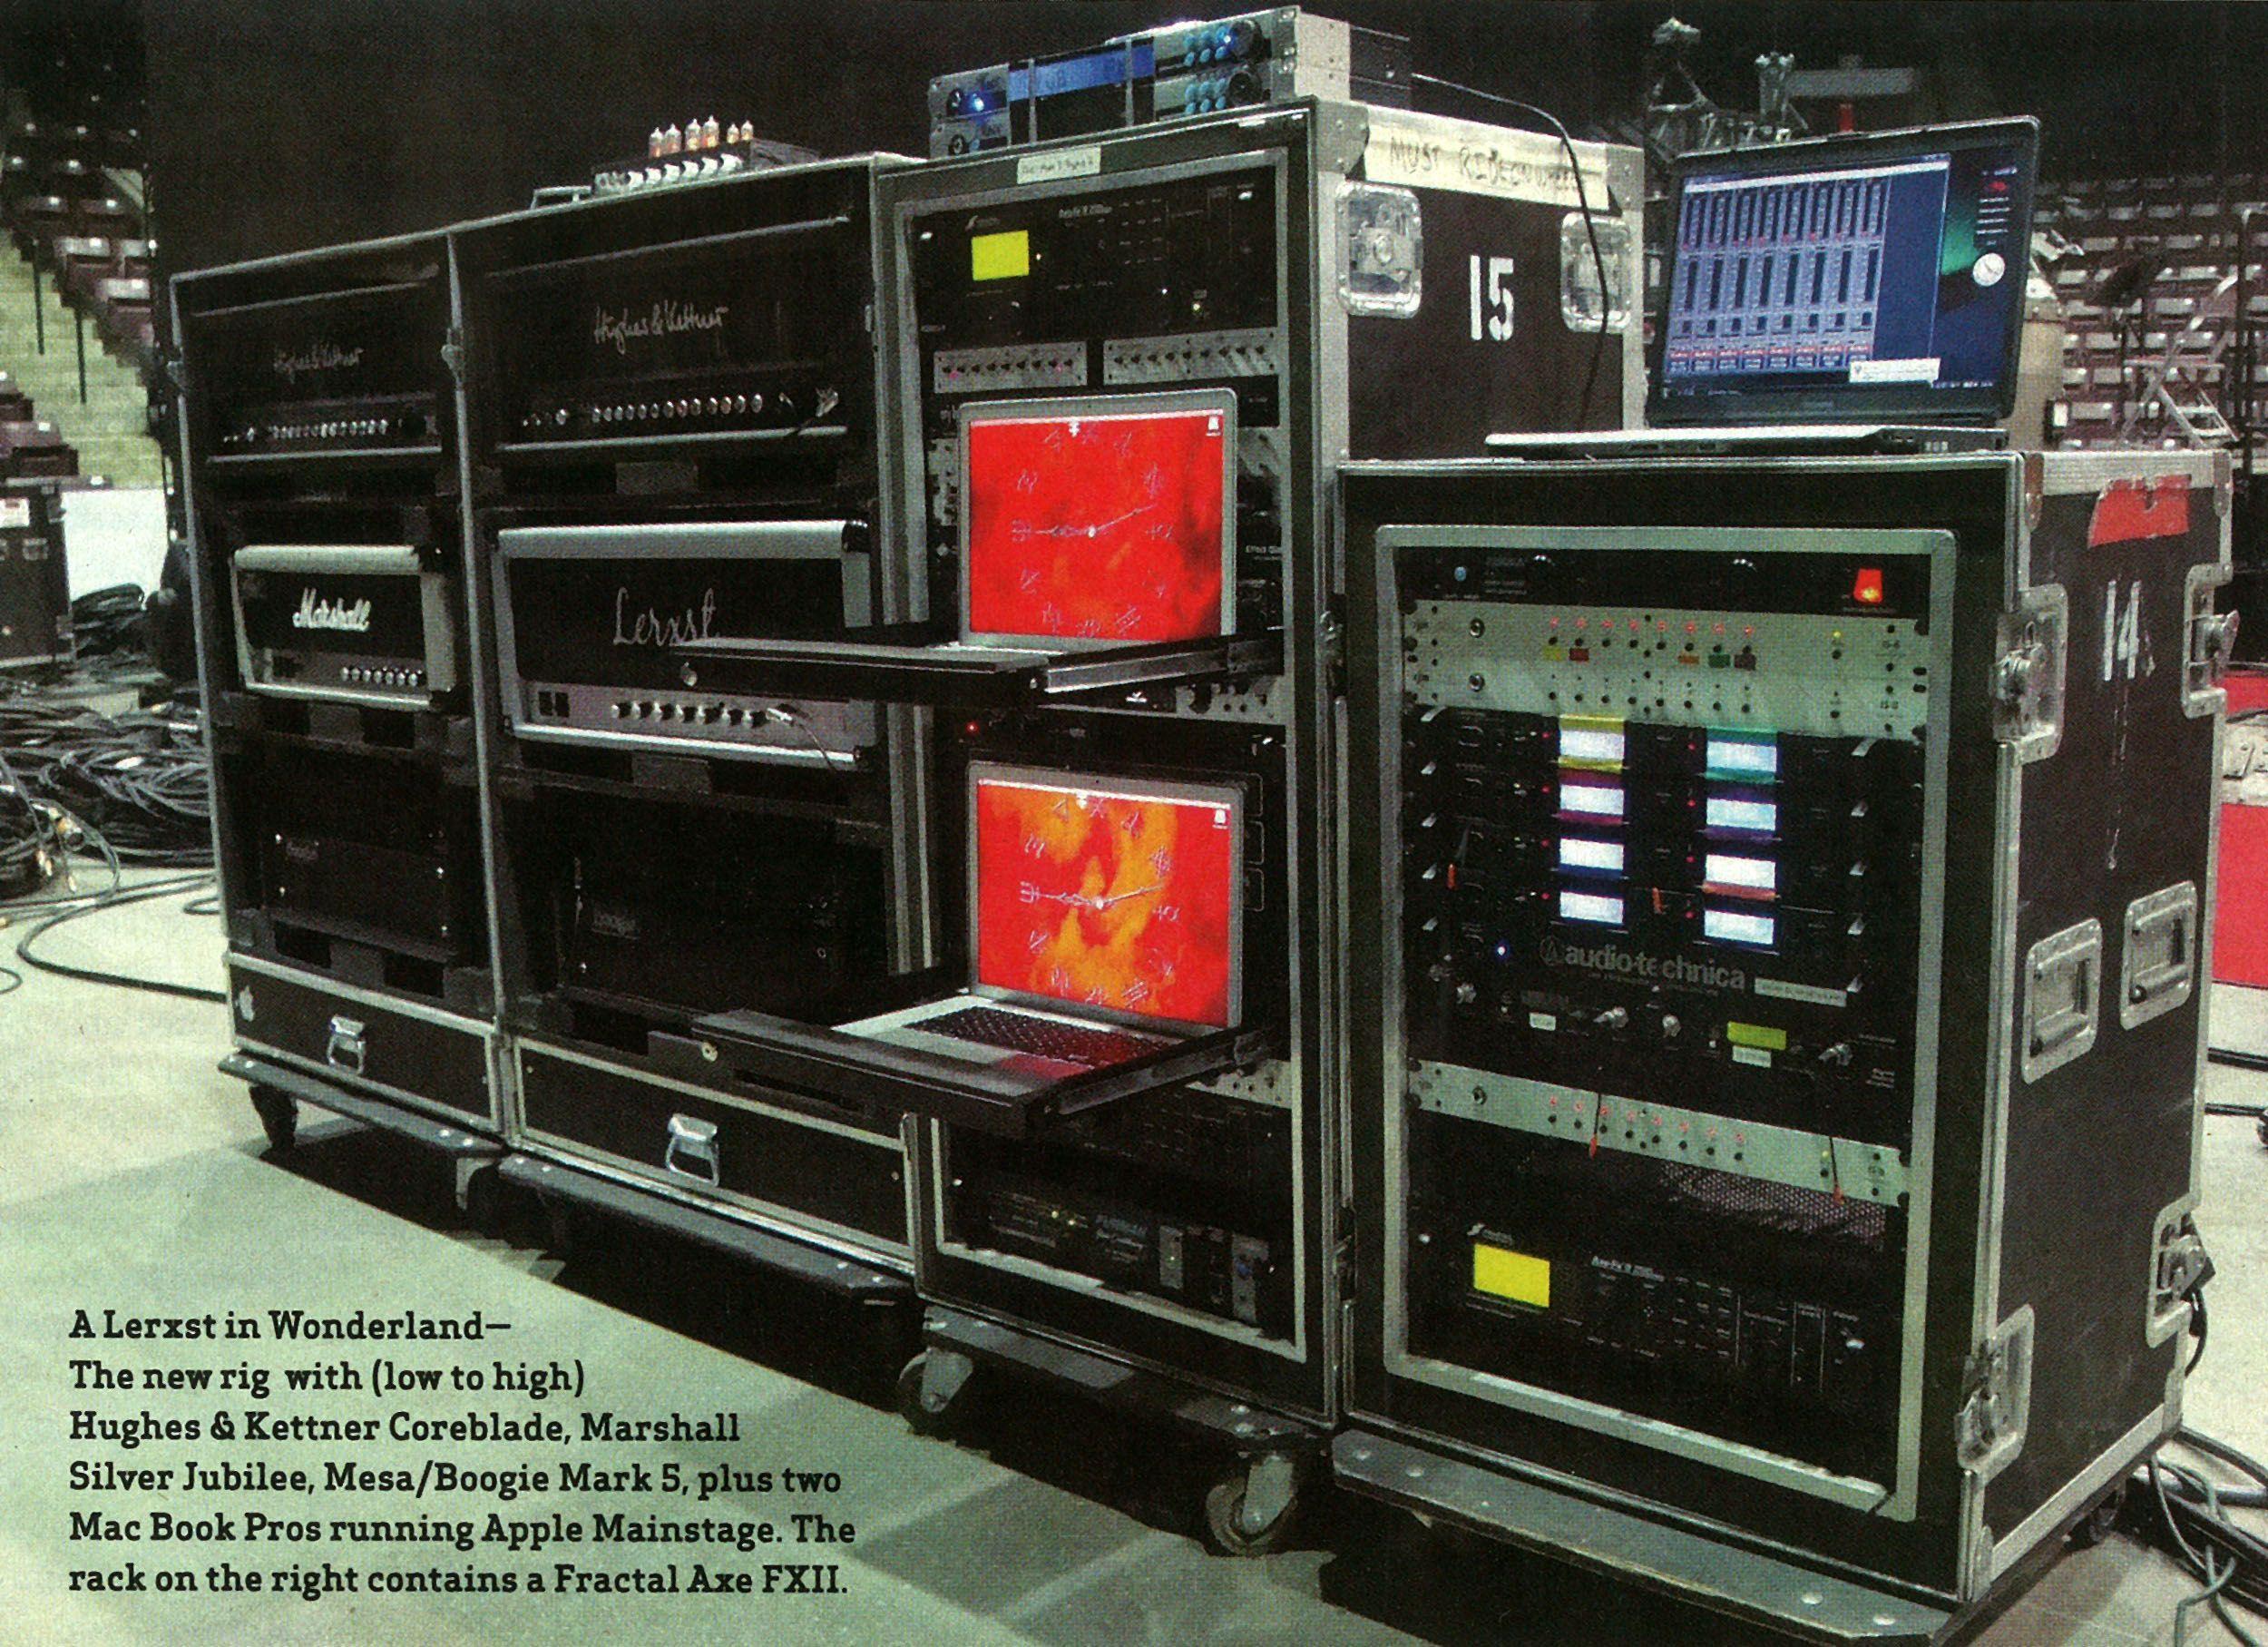 alex lifeson guitar rig amplifiers guitar rig bass amps alex lifeson. Black Bedroom Furniture Sets. Home Design Ideas